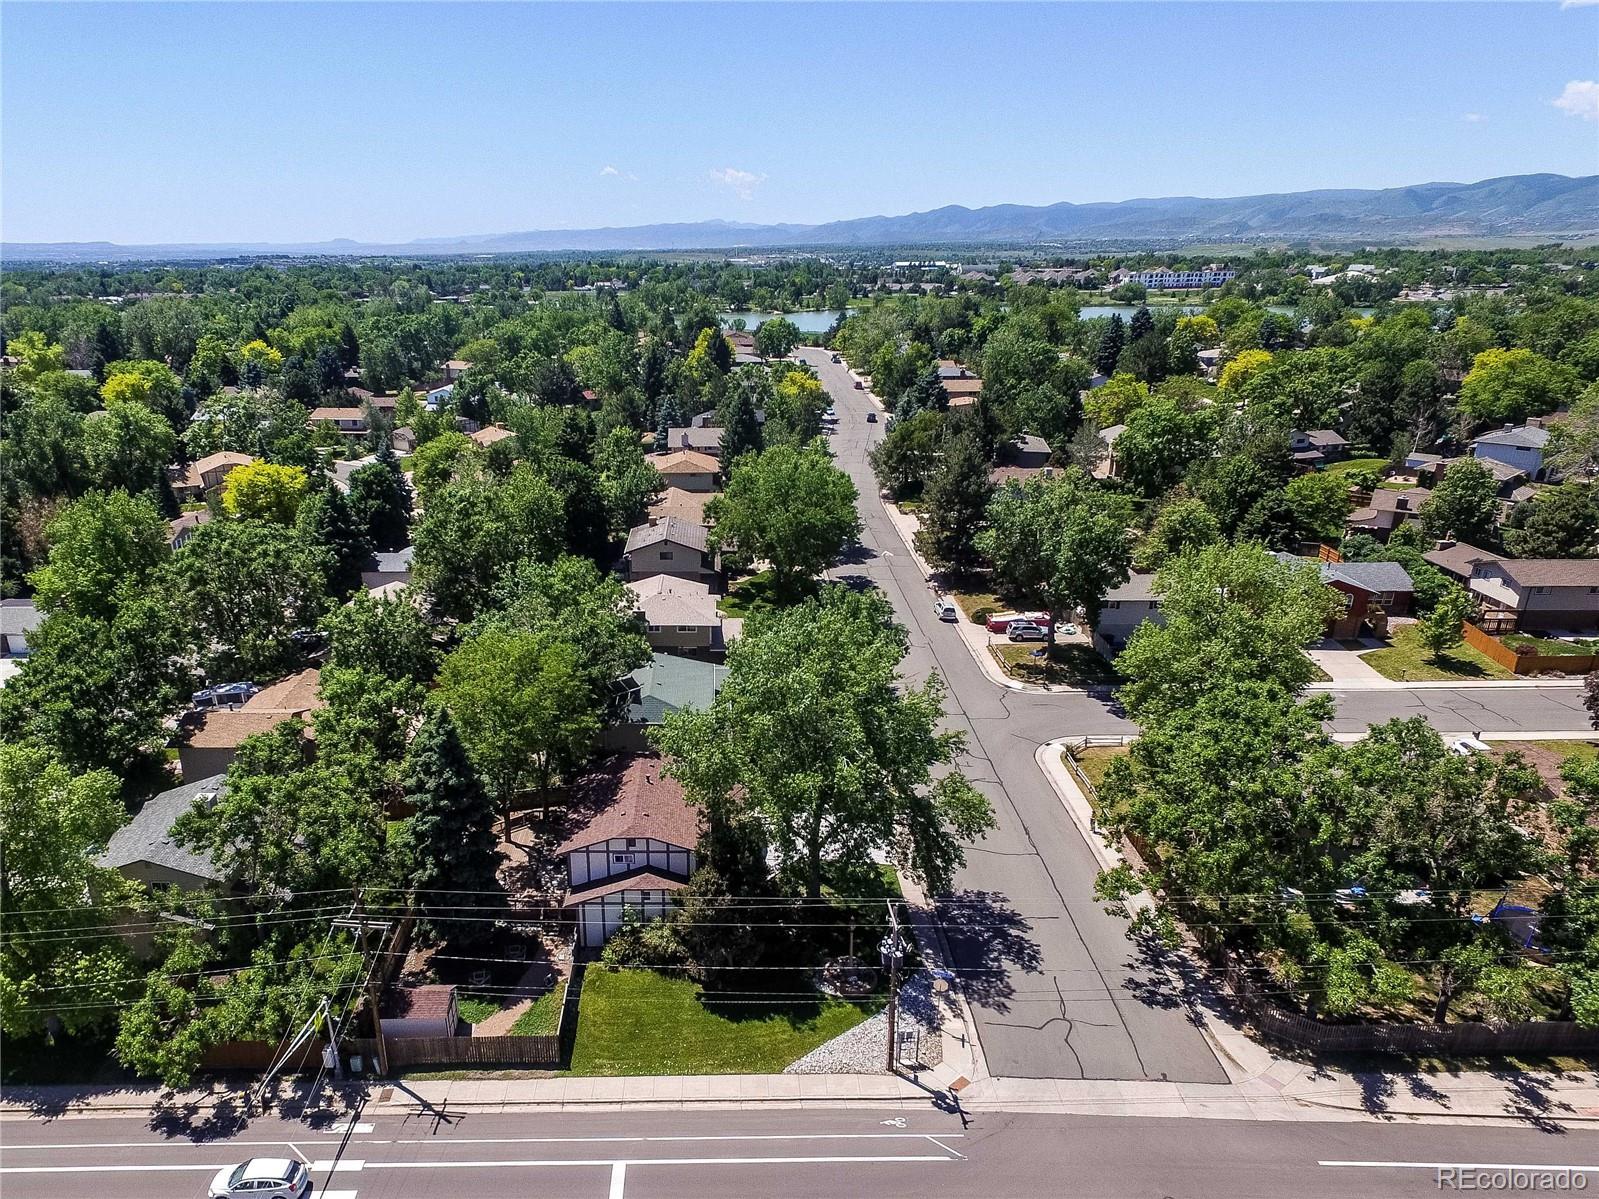 MLS# 3238375 - 38 - 1506 S Hoyt Street, Lakewood, CO 80232